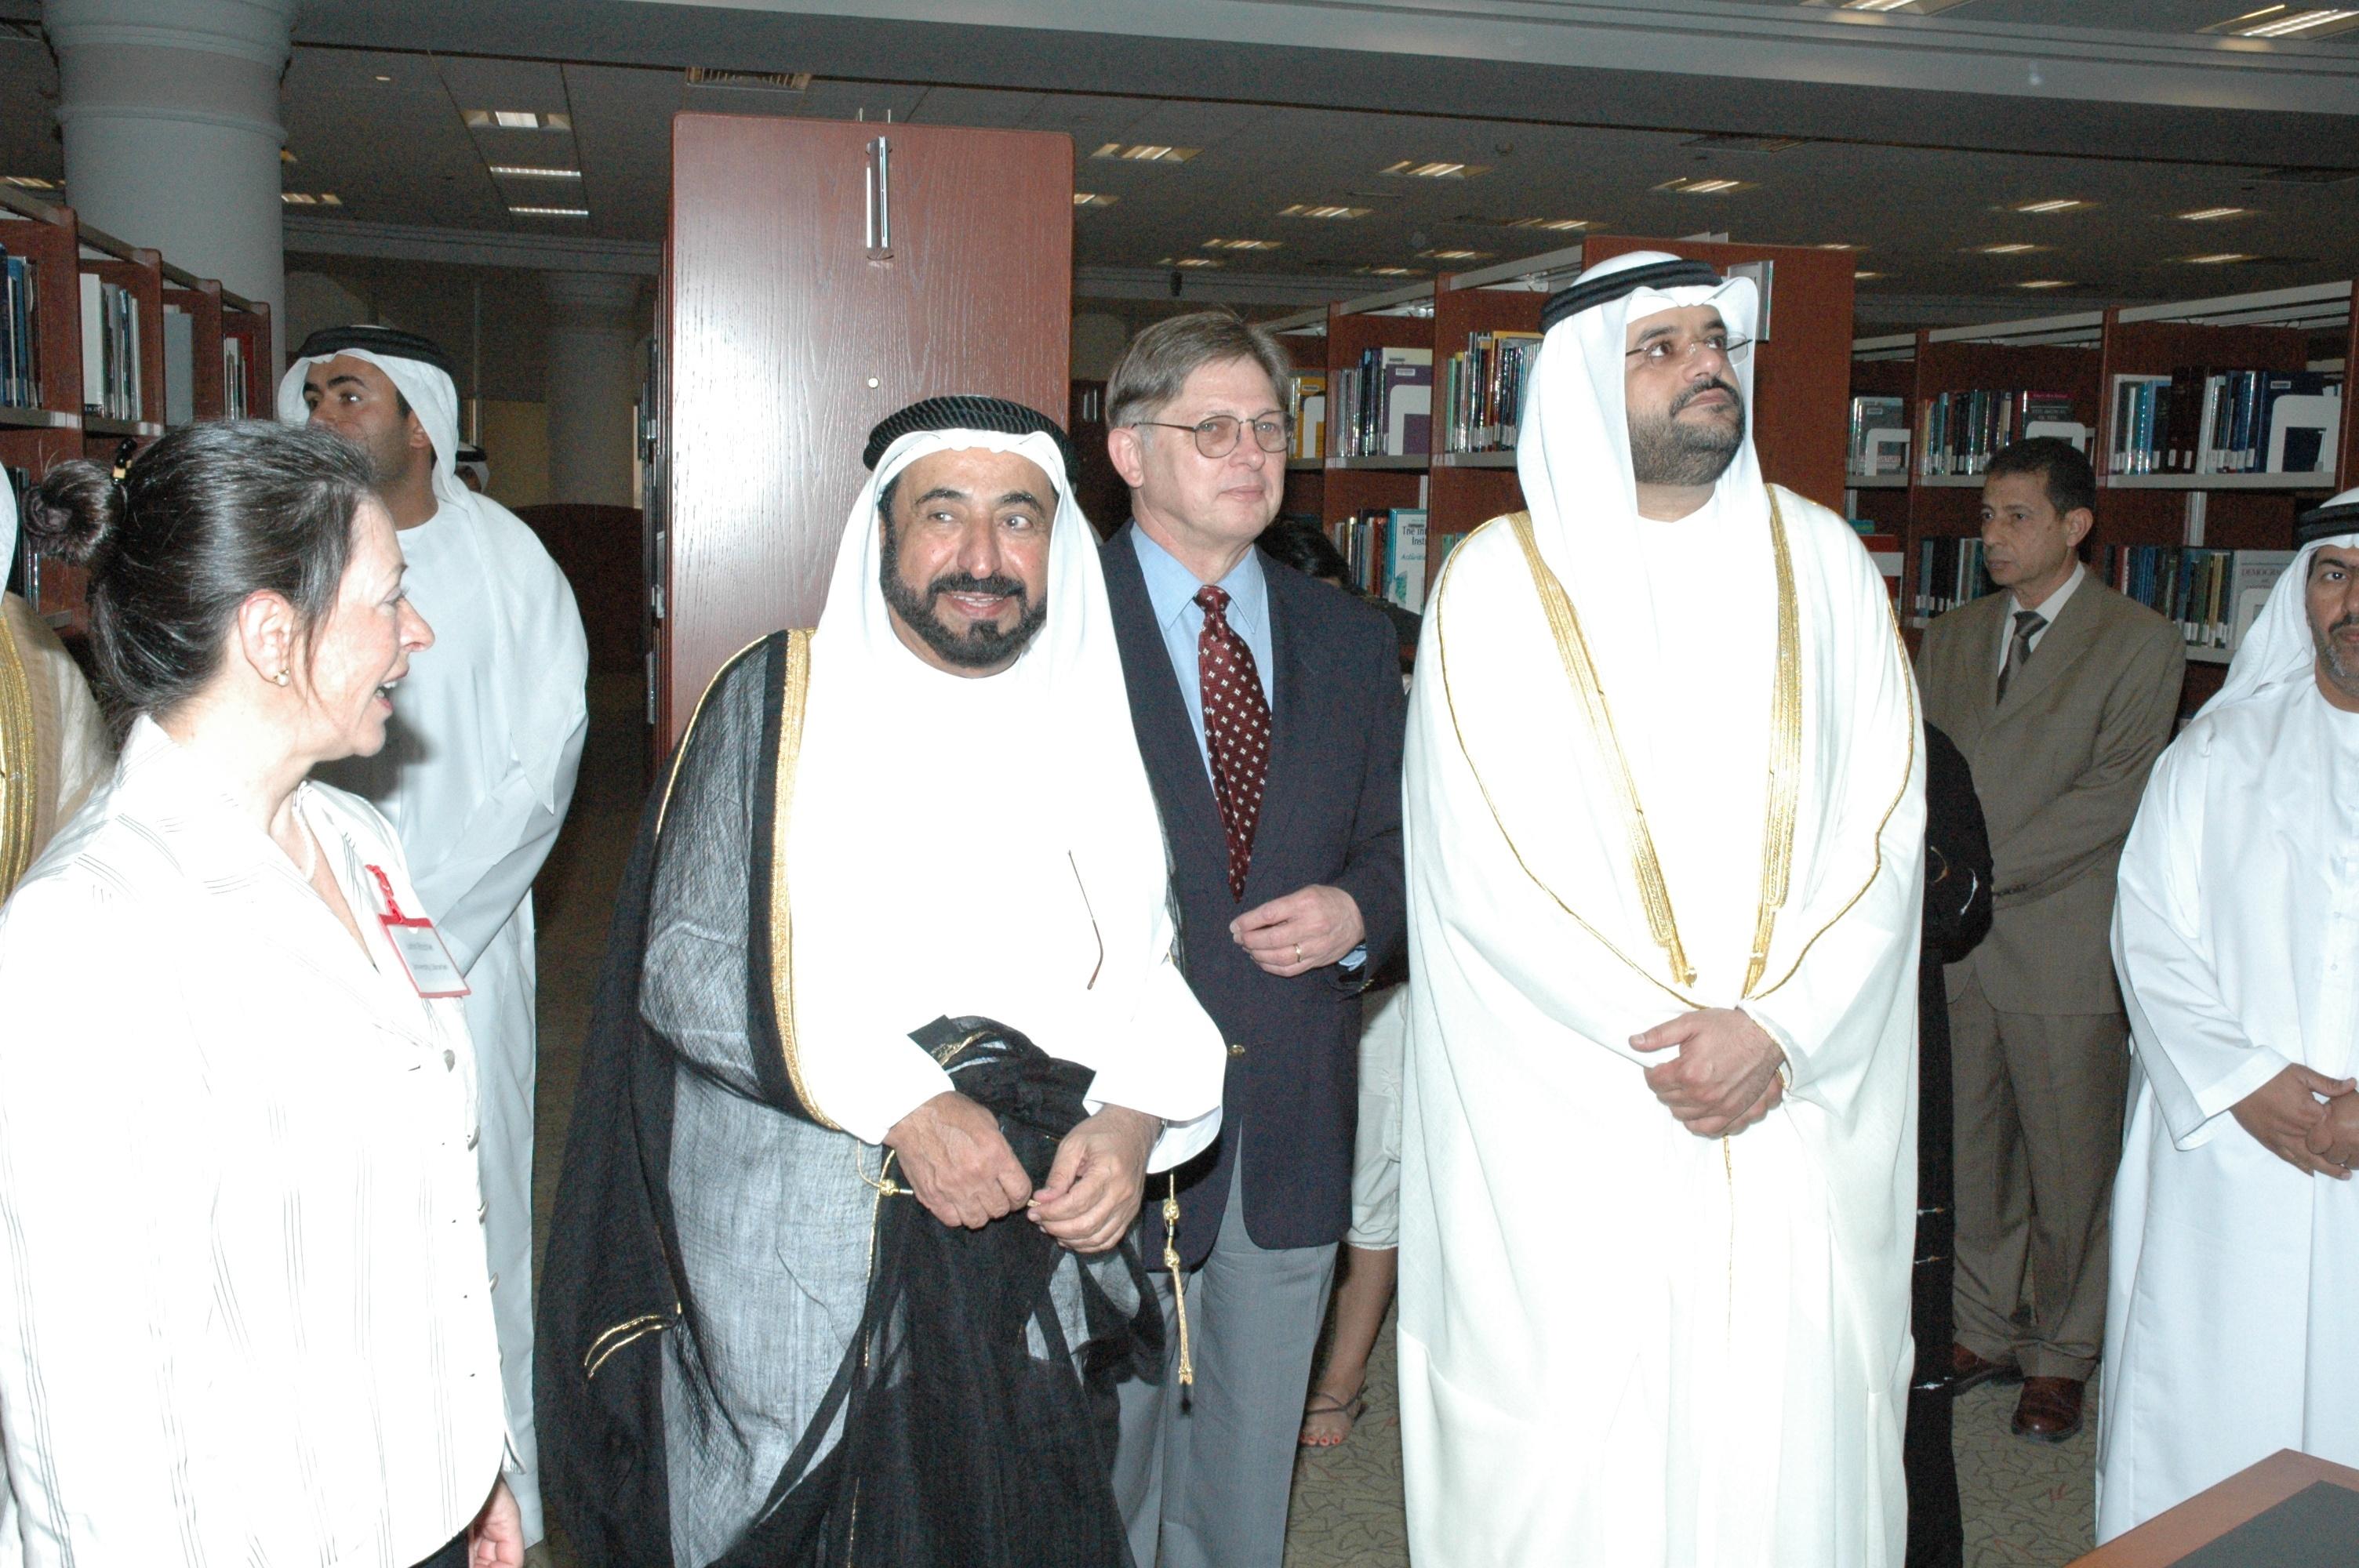 American_University_of_Sharjah_Library_5.jpg